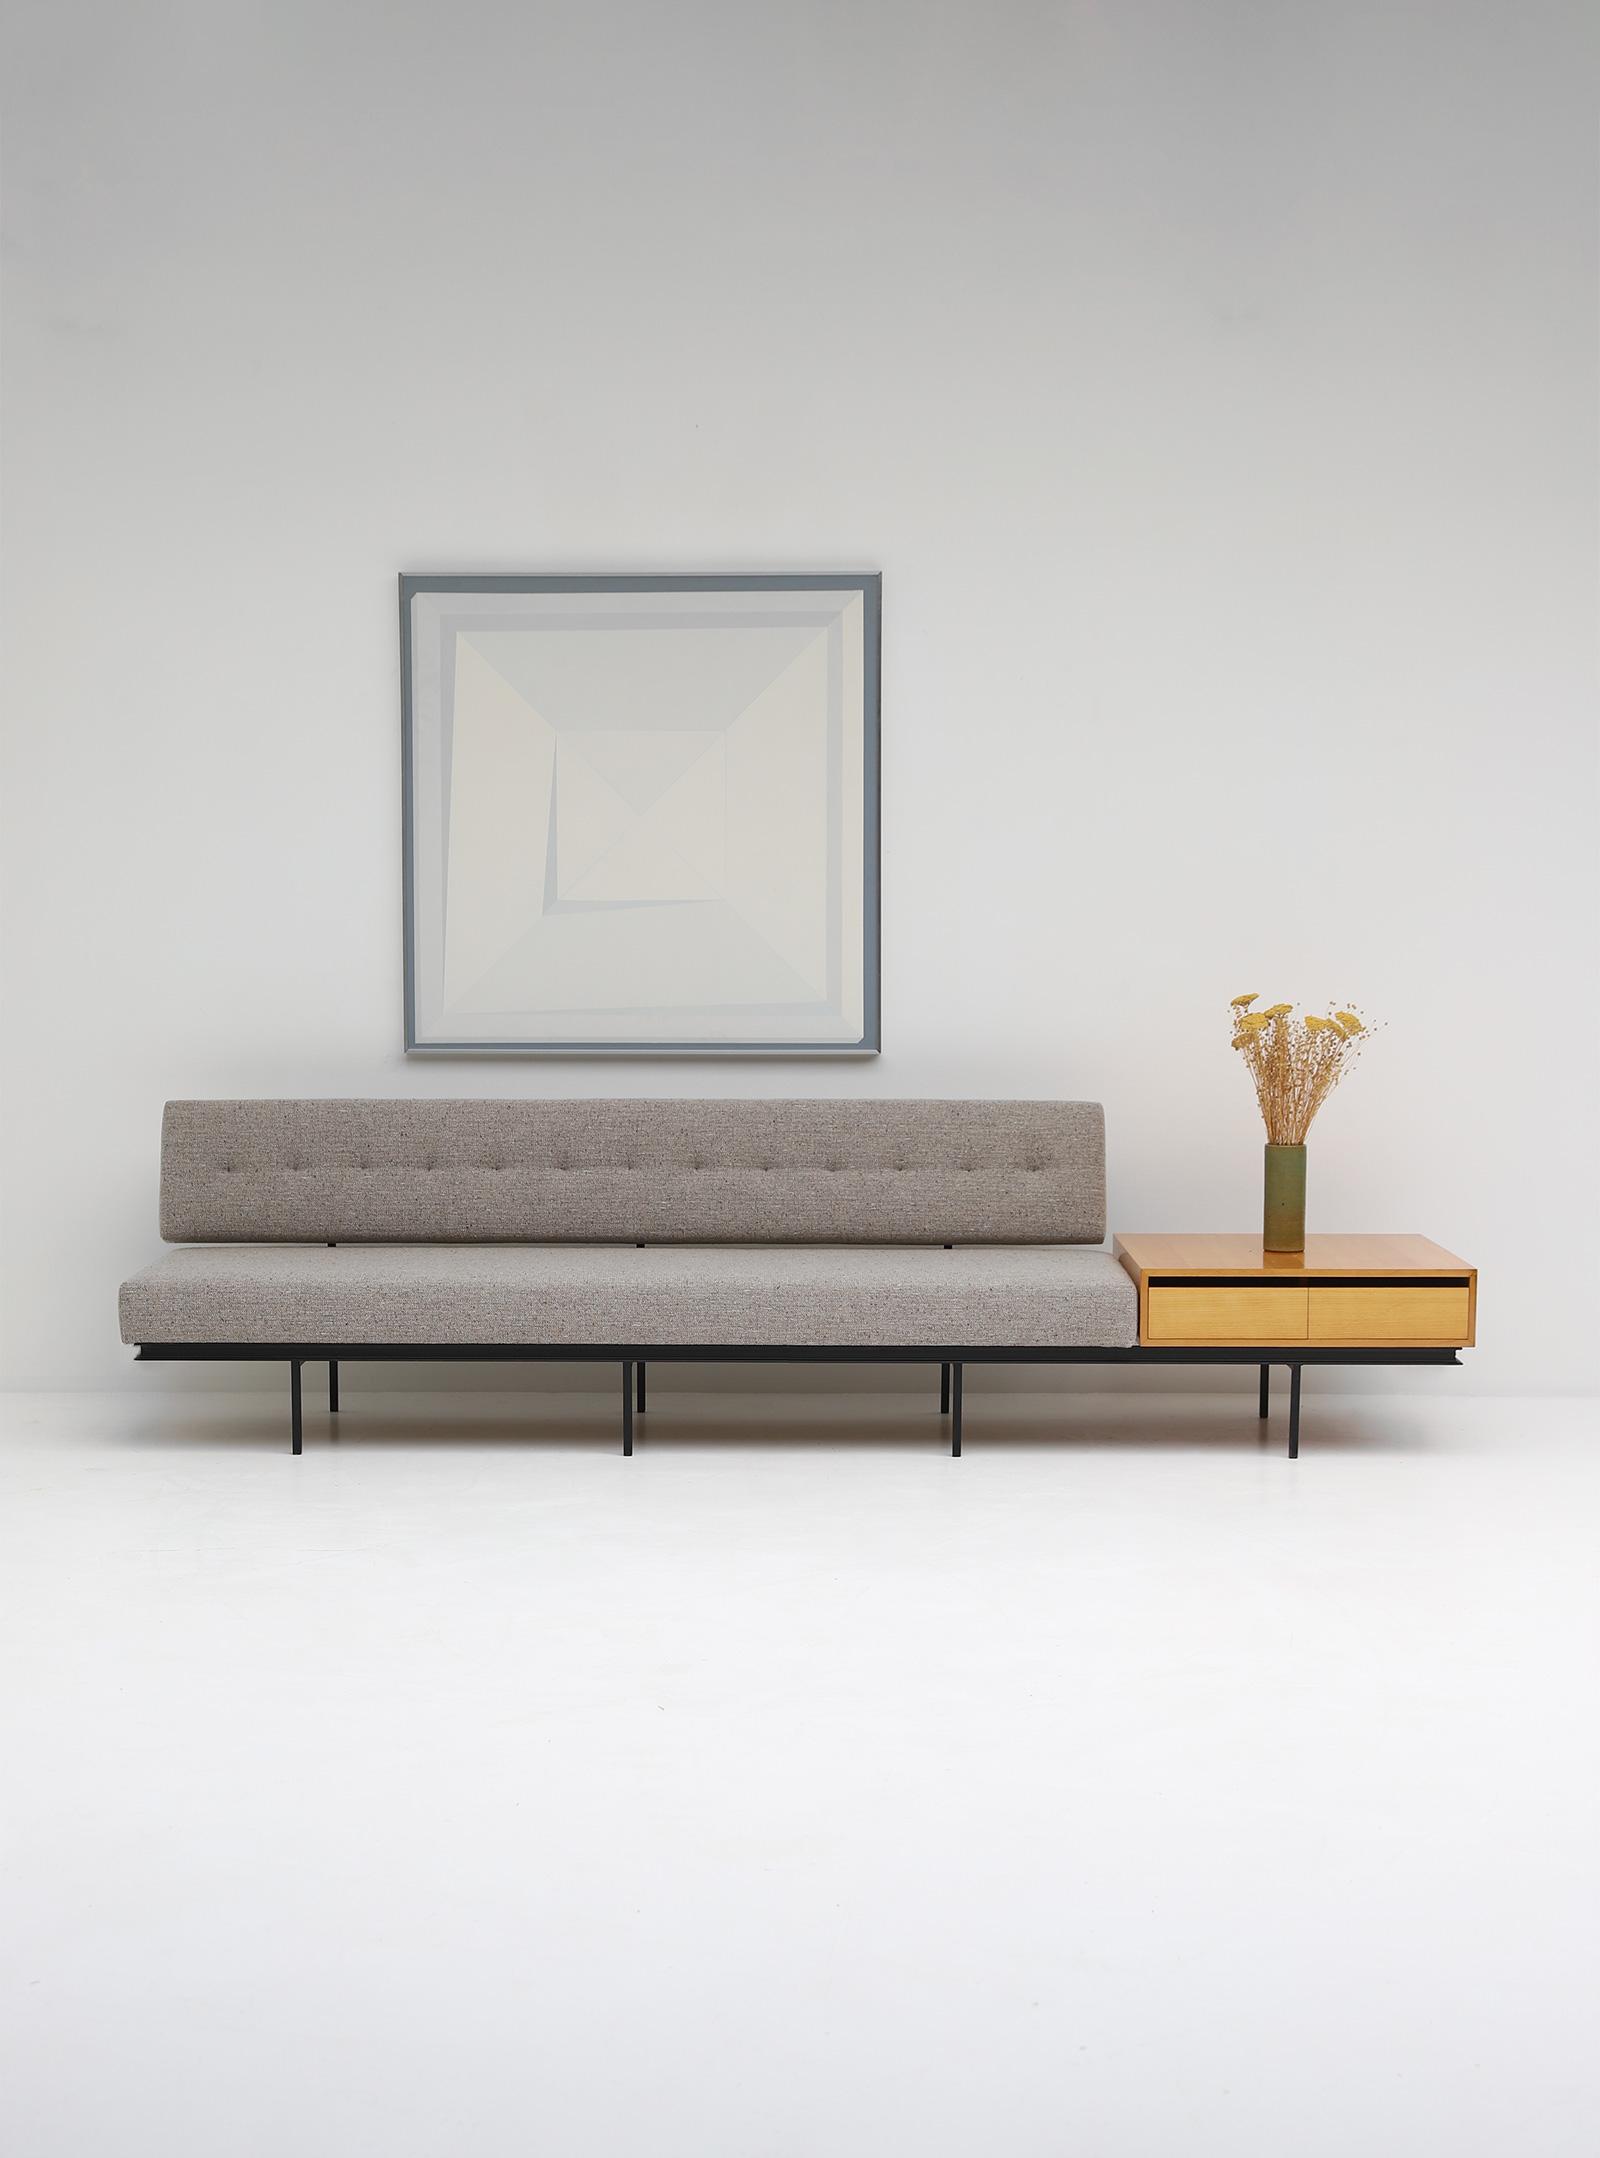 Florence Knoll Sofa & Cabinet image 1